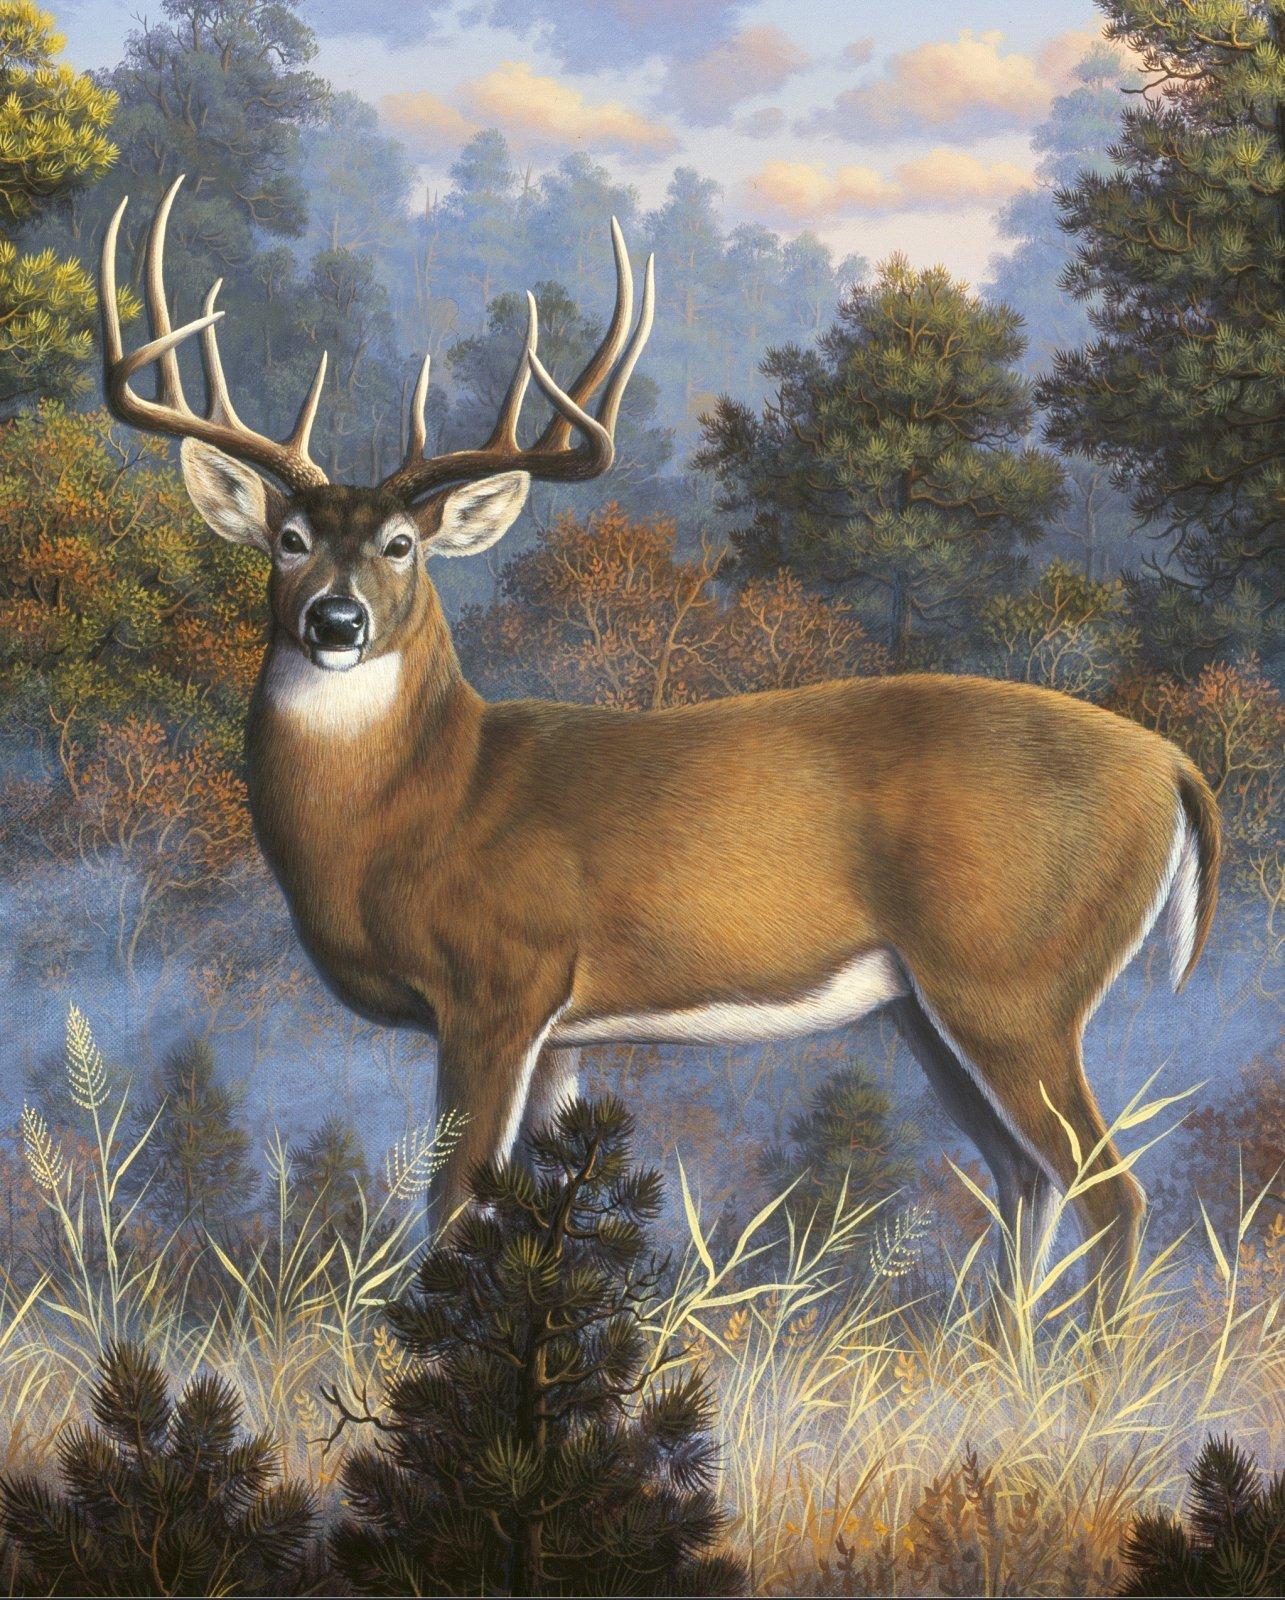 Morning Light Deer Panel by David Textiles